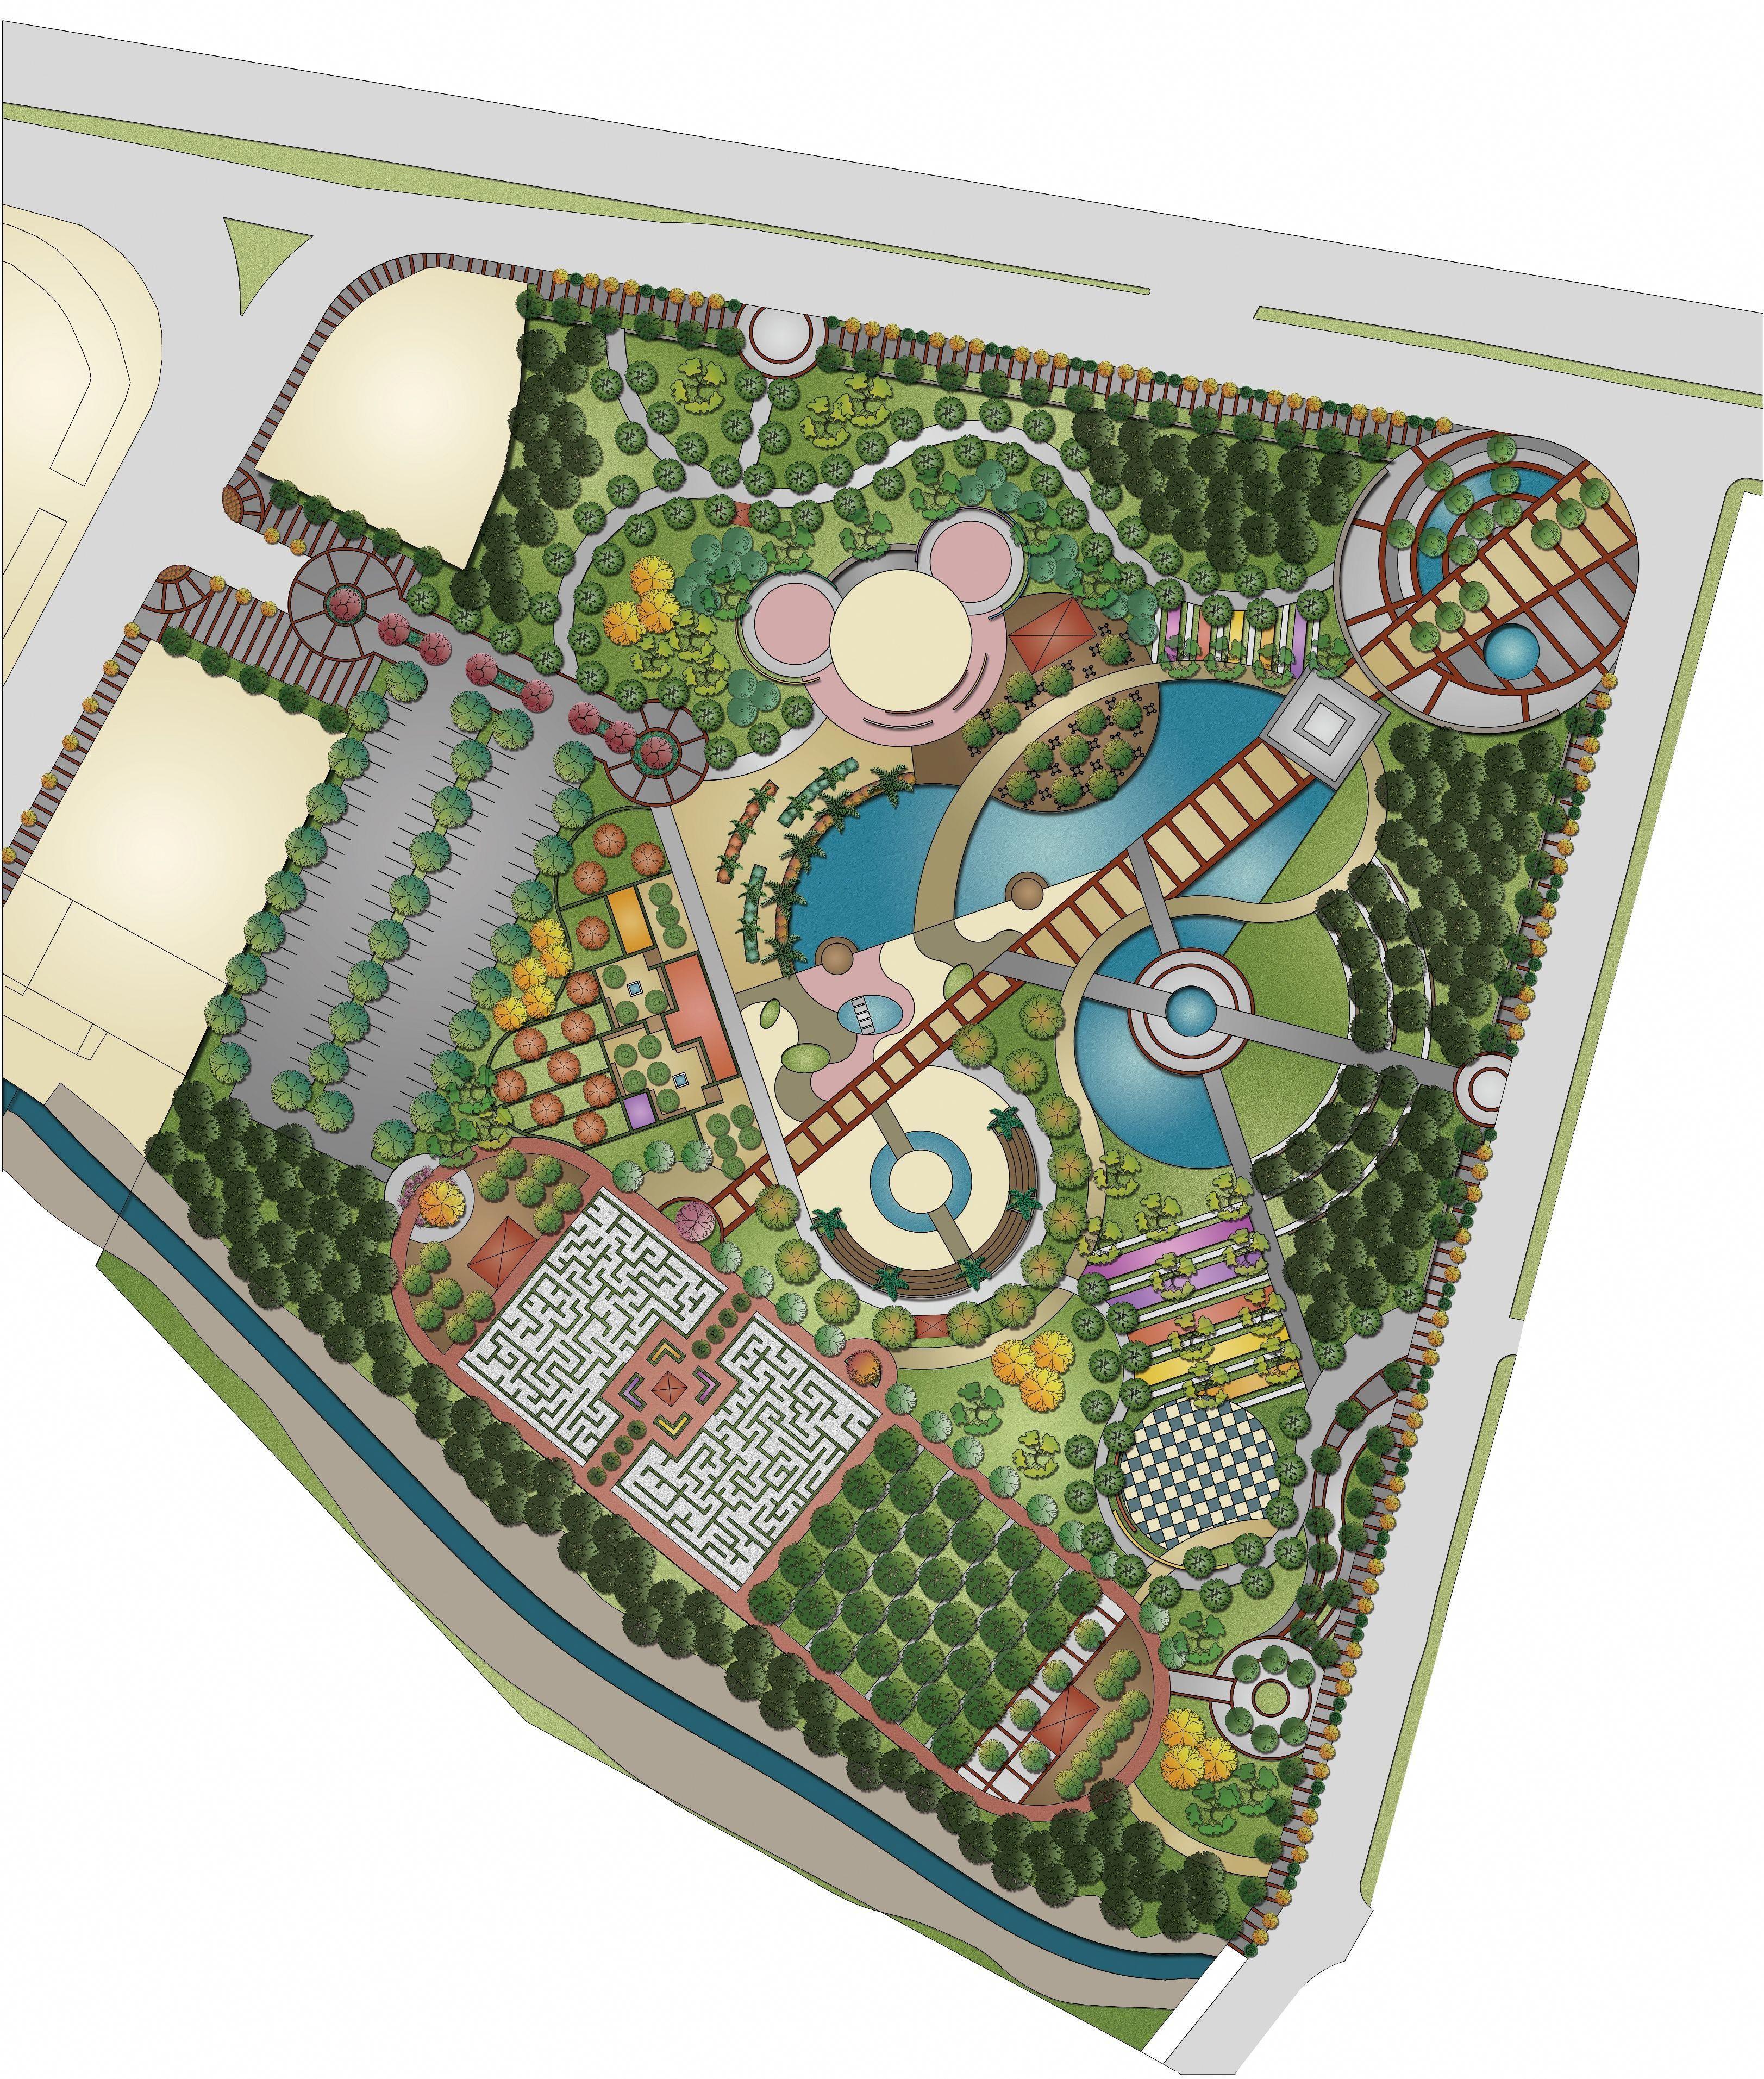 Urban Park Landscape Design Plan Urbanlandscapearchitecture Kent Parki Peyzaj Tasarimi Peyzaj Mimarisi